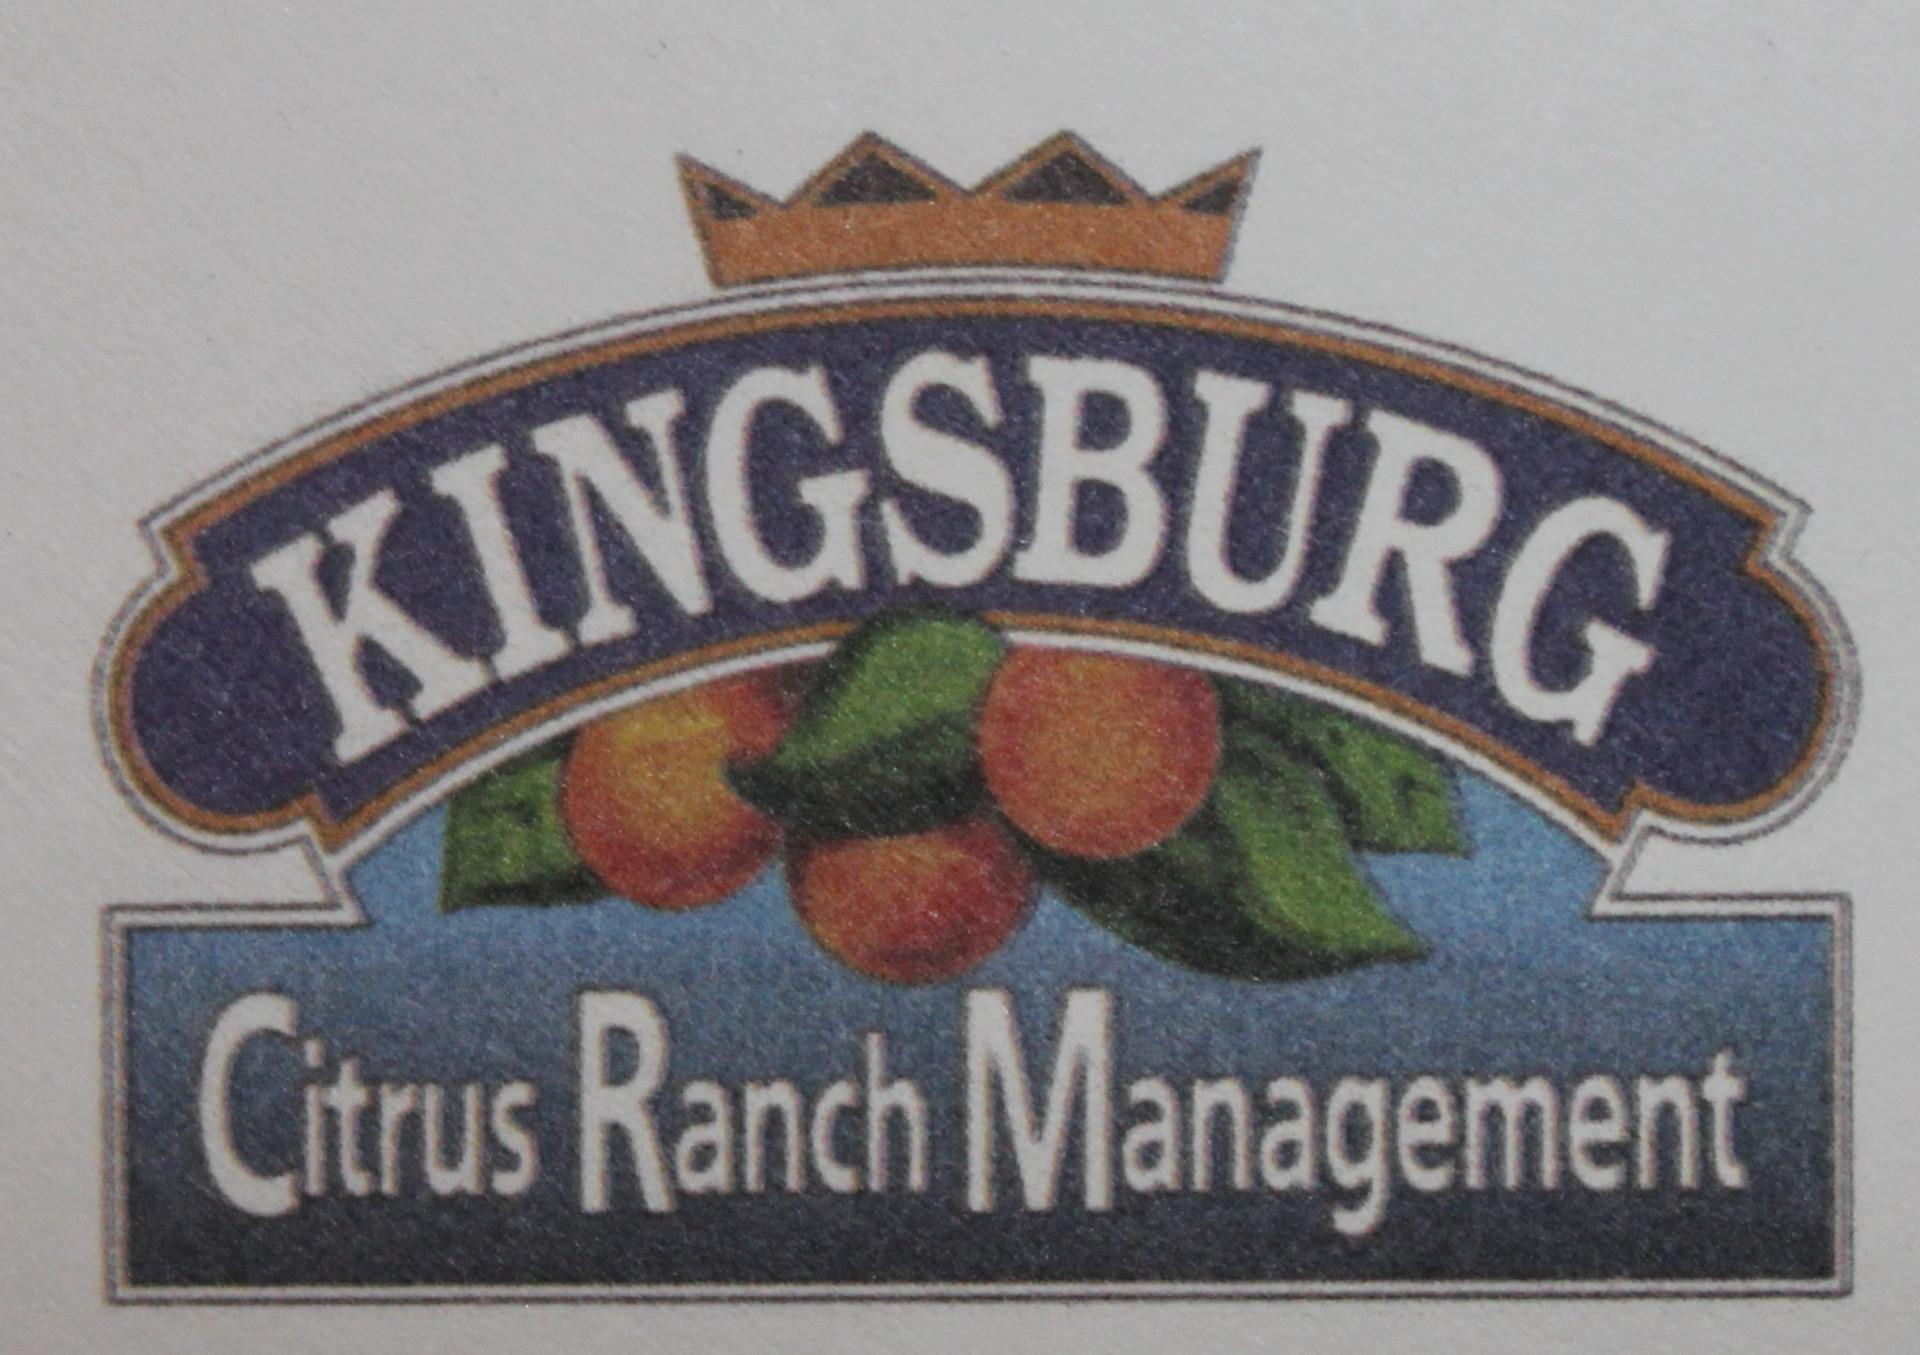 Kingsburg Citrus Ranch